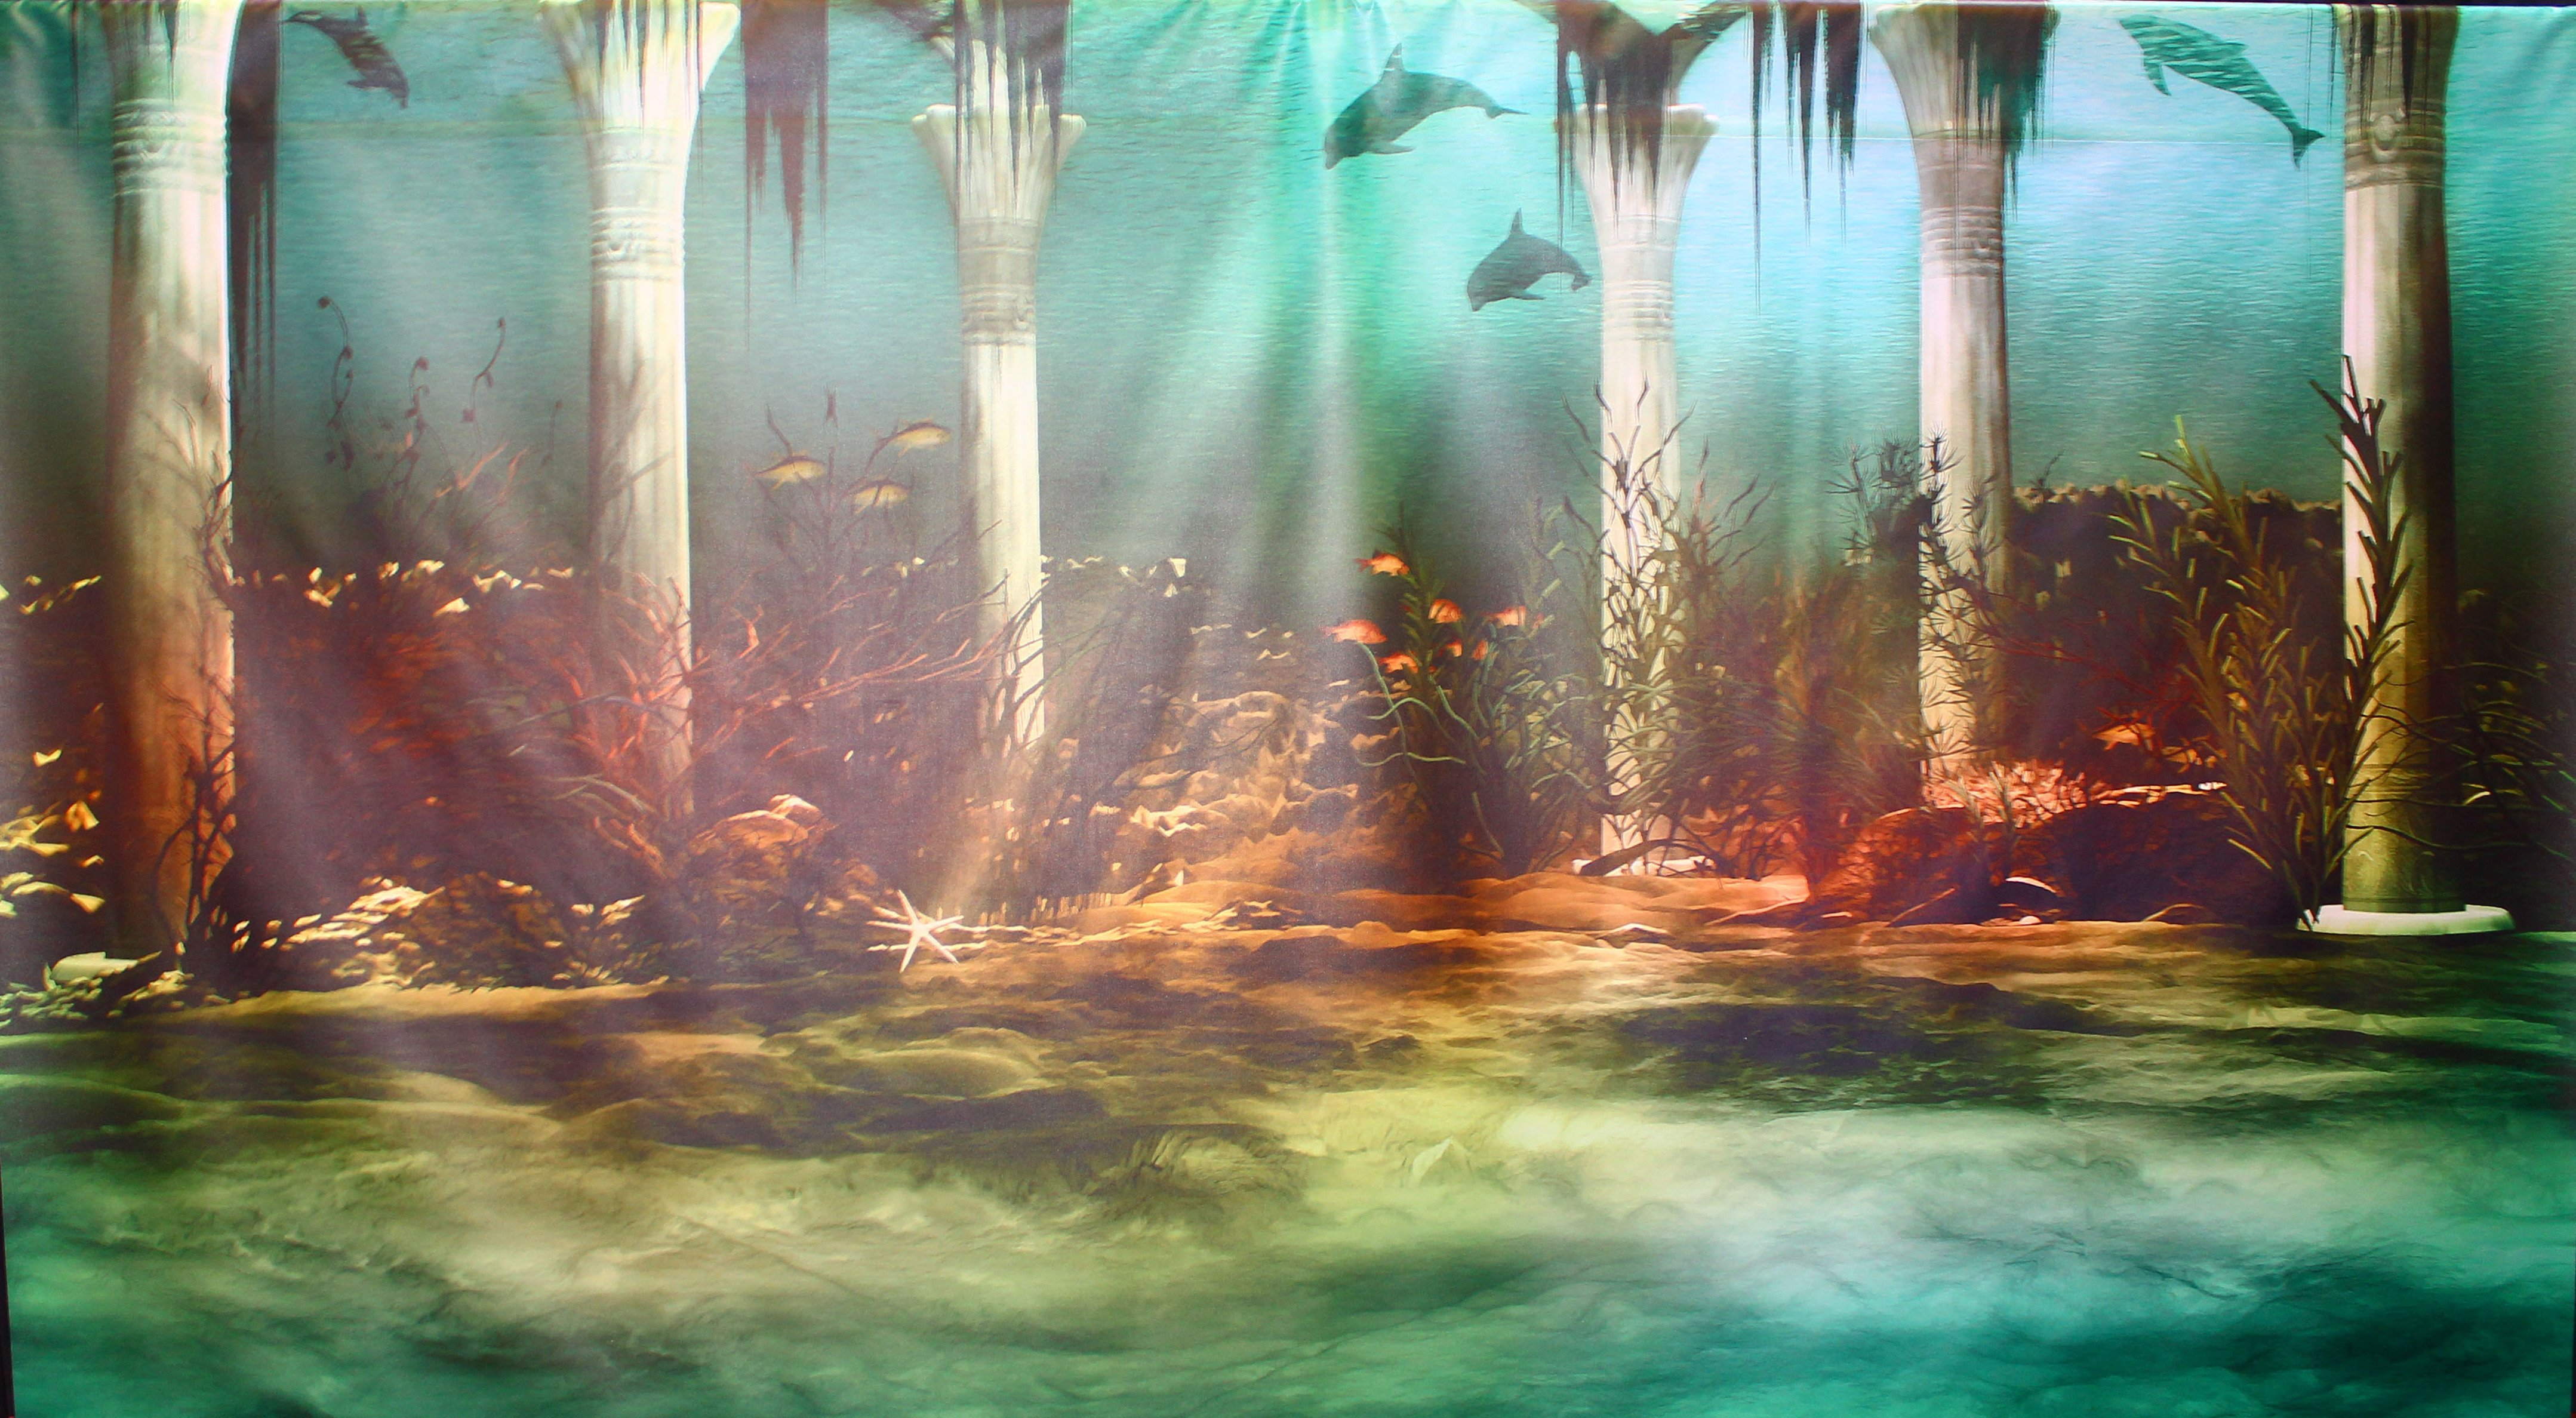 Backdrop Atlantis Under The Sea 4m x 2.3m $100 incl frame & gst